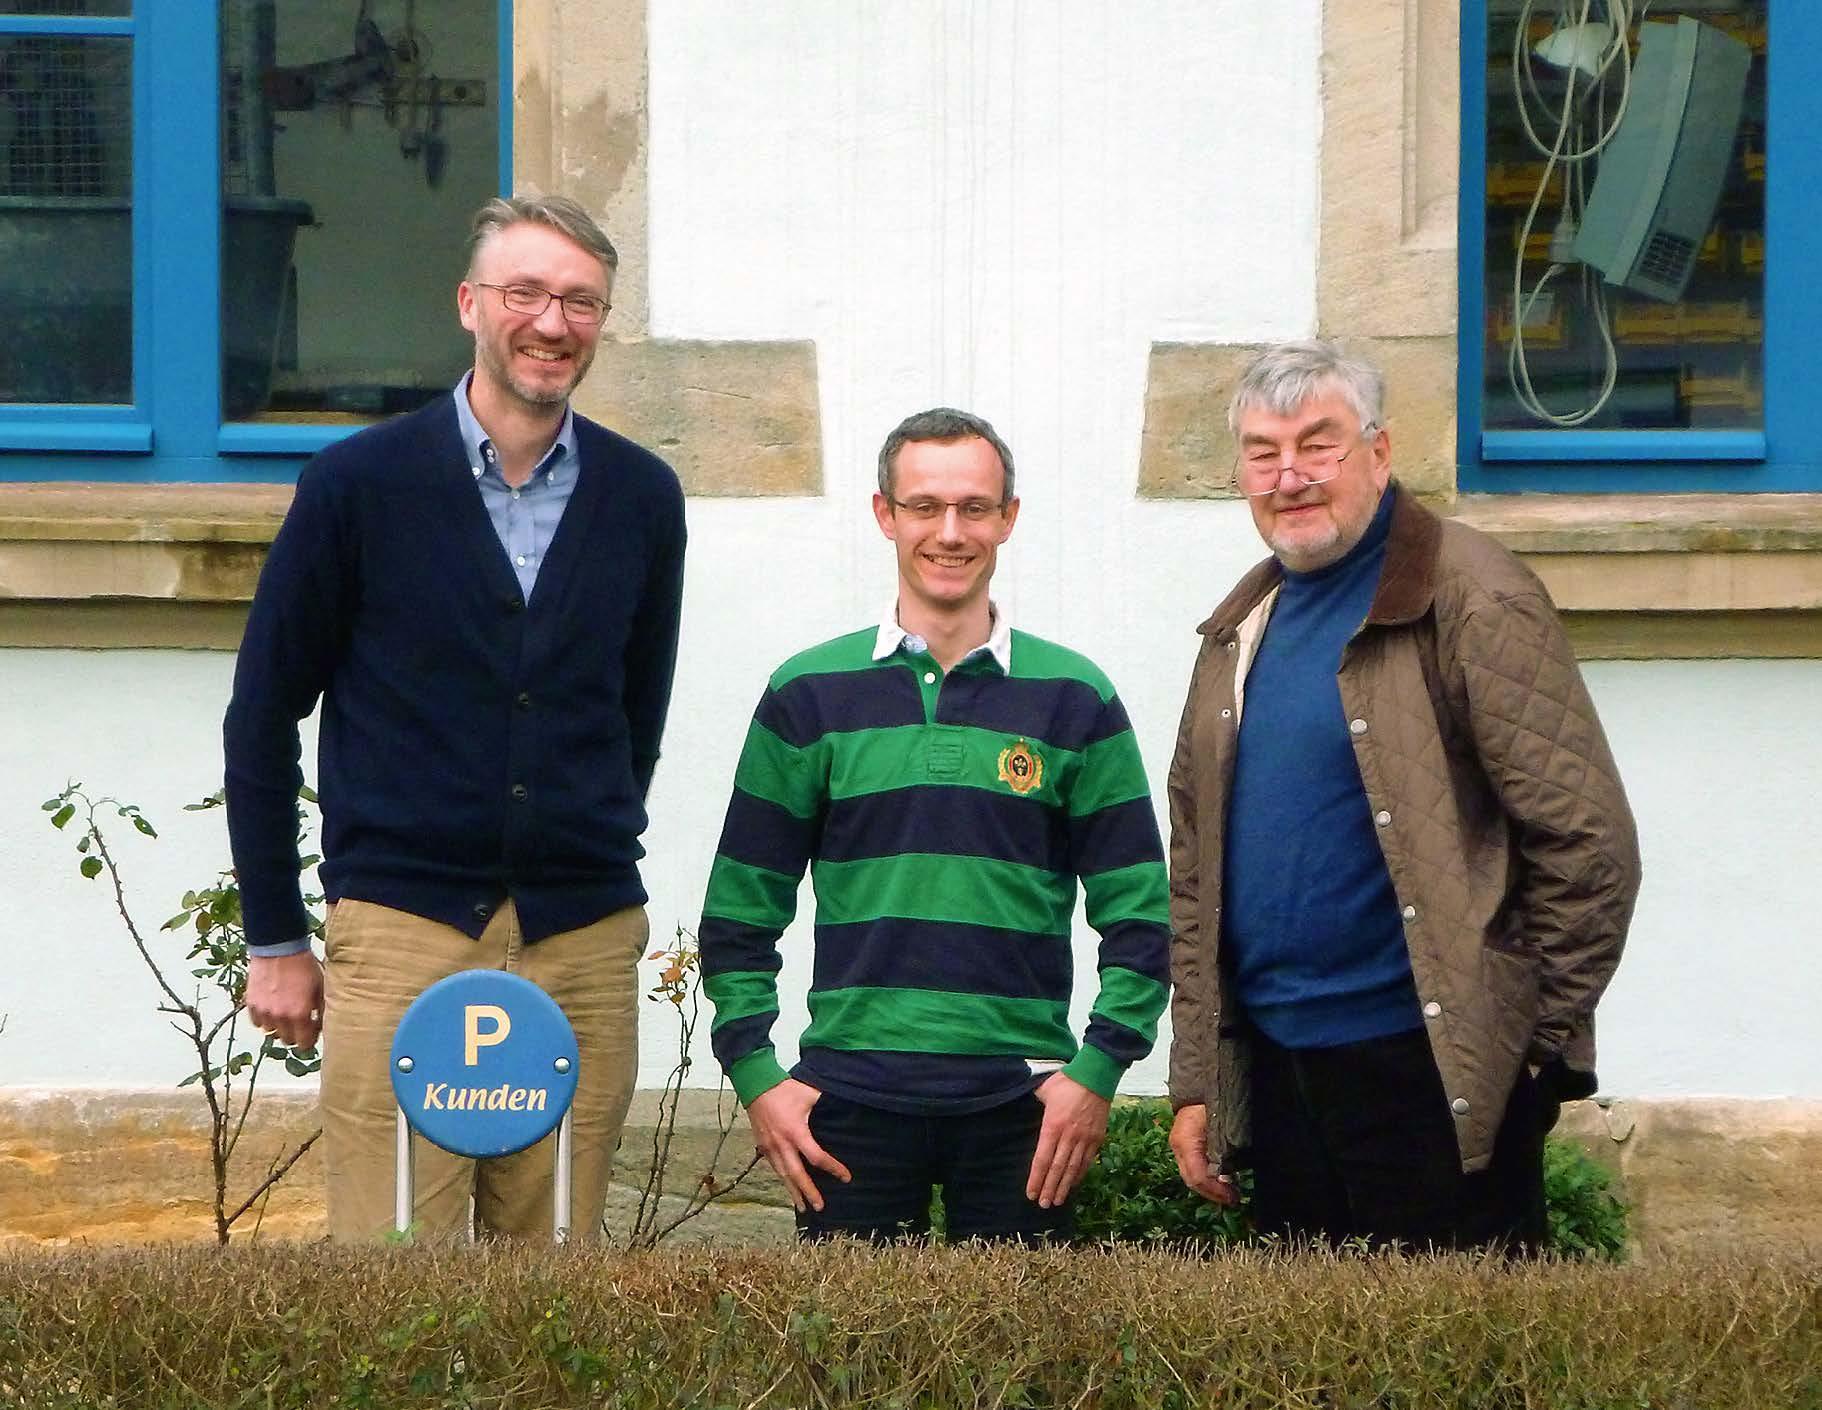 Fabian Denk, Gerben van Limpt, Franz Denk vor dem Firmensitz, der ehemaligen Schule des Ortes